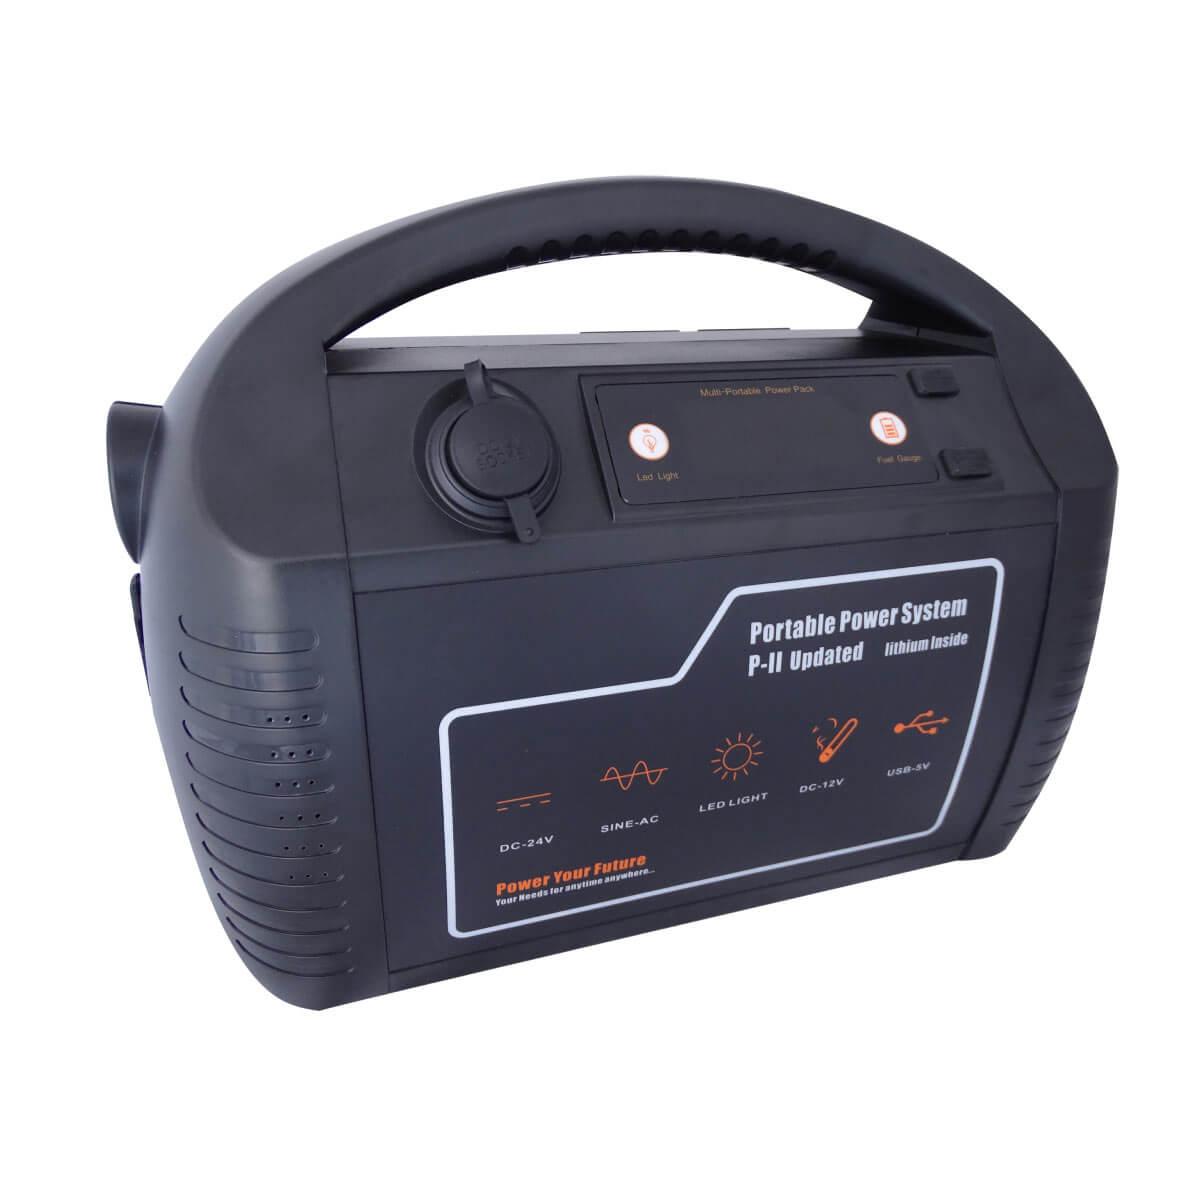 Valise d'énergie 220V 1350Wh + chargeur 18A